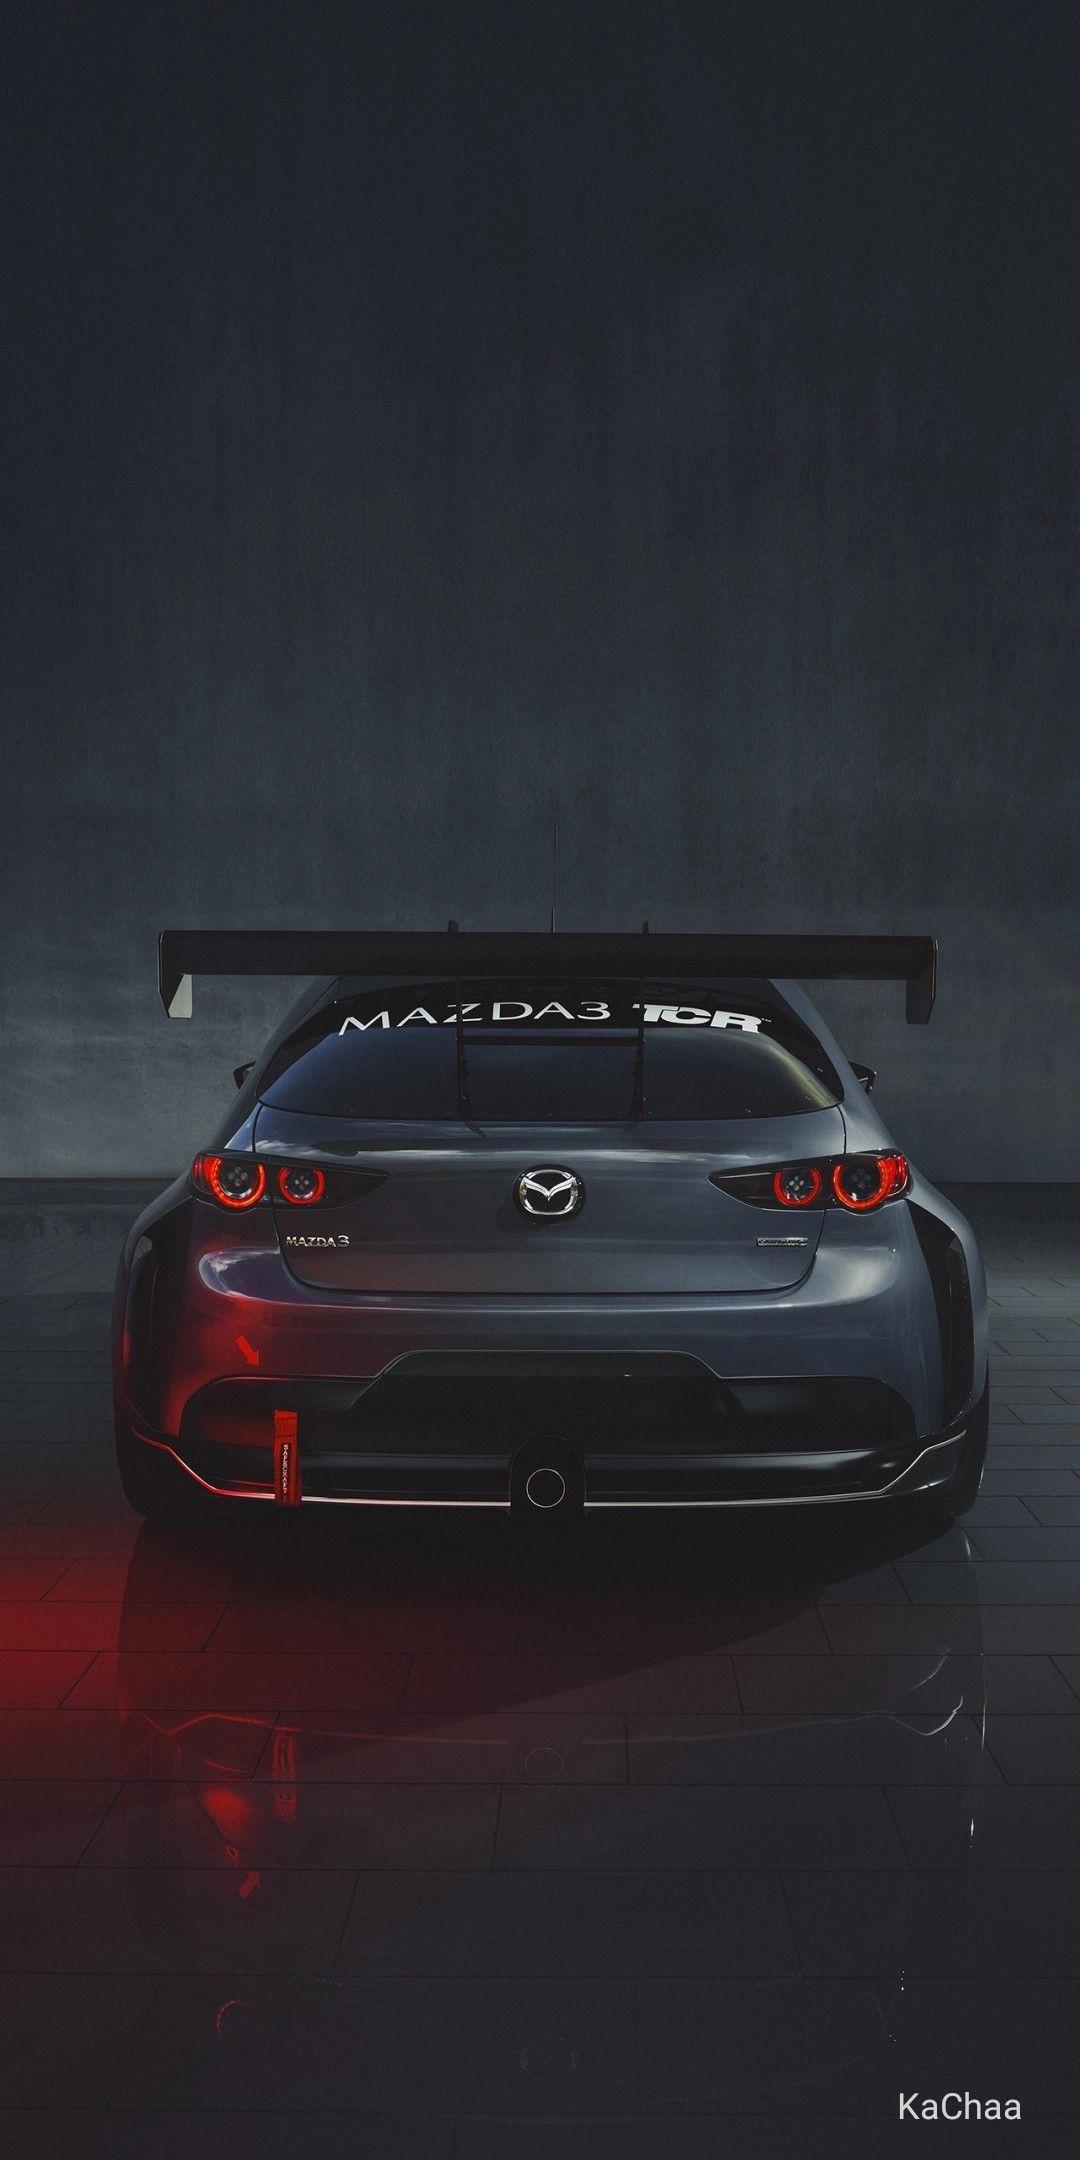 Mazda 3 Tcr Mazda Mazda 3 Hatchback Sports Car